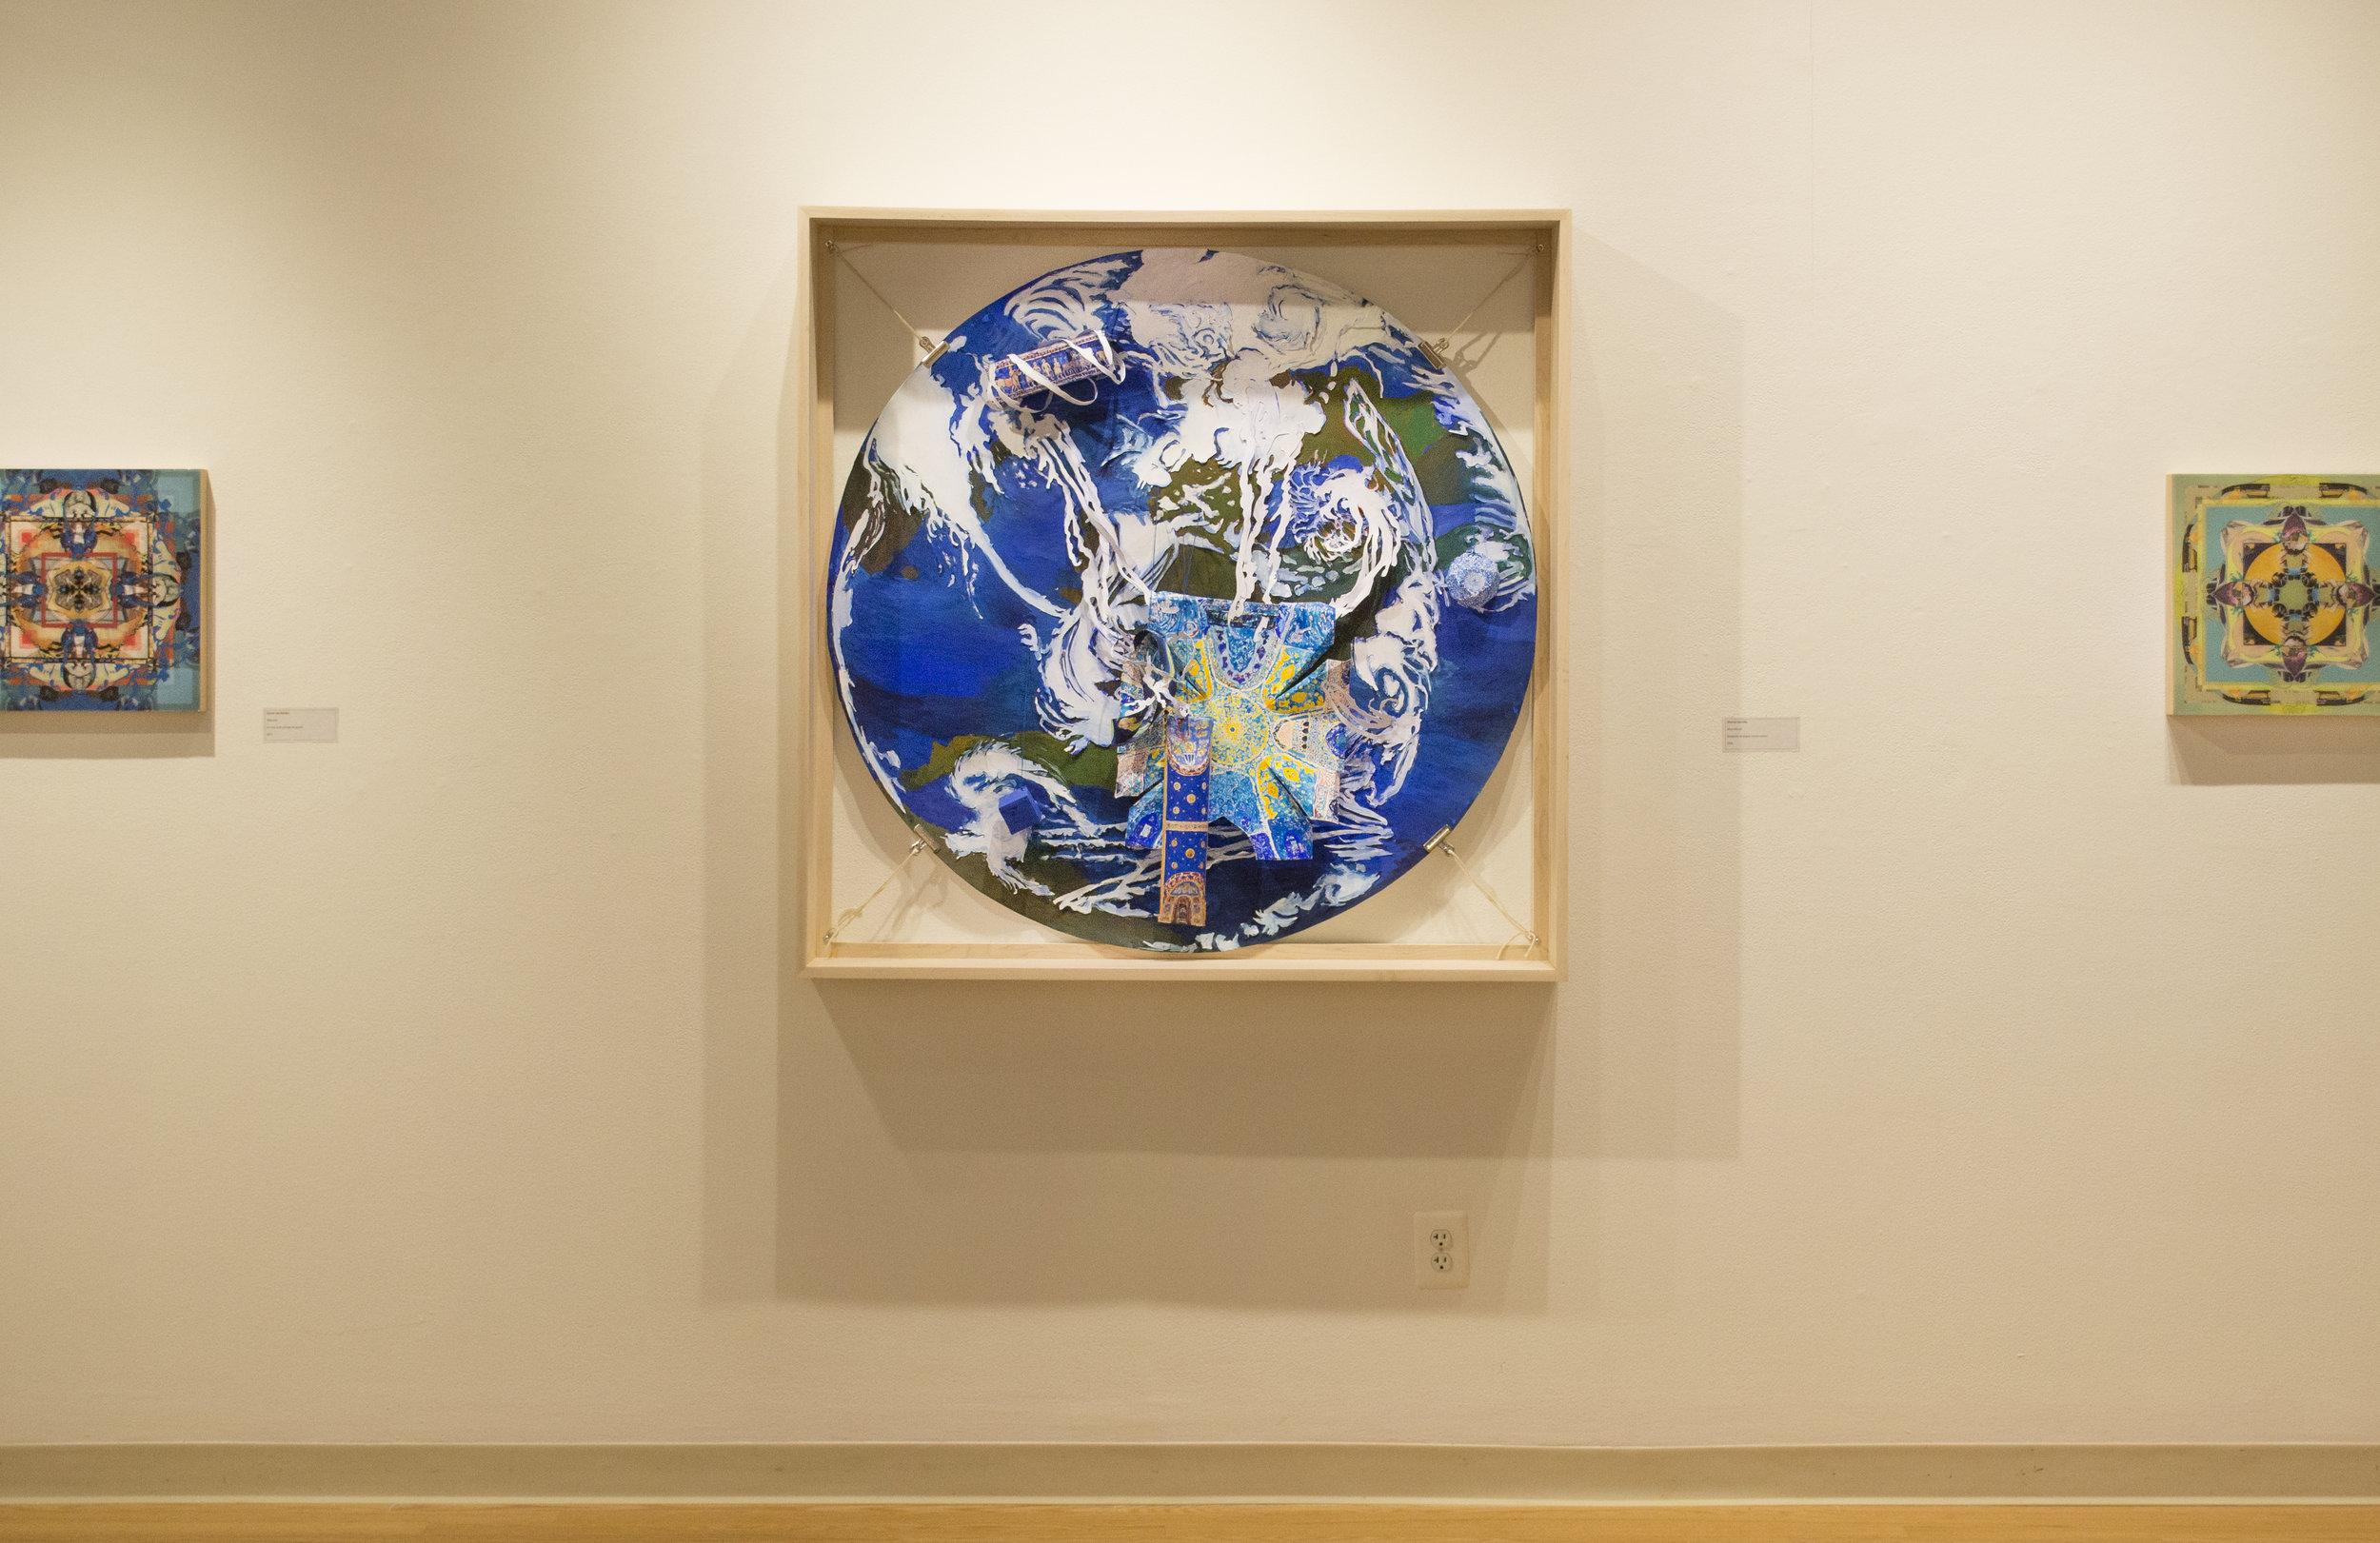 Installation shot with Sylvie van Helden, from Temporal Embodiments at Julio Gallery, Loyola University